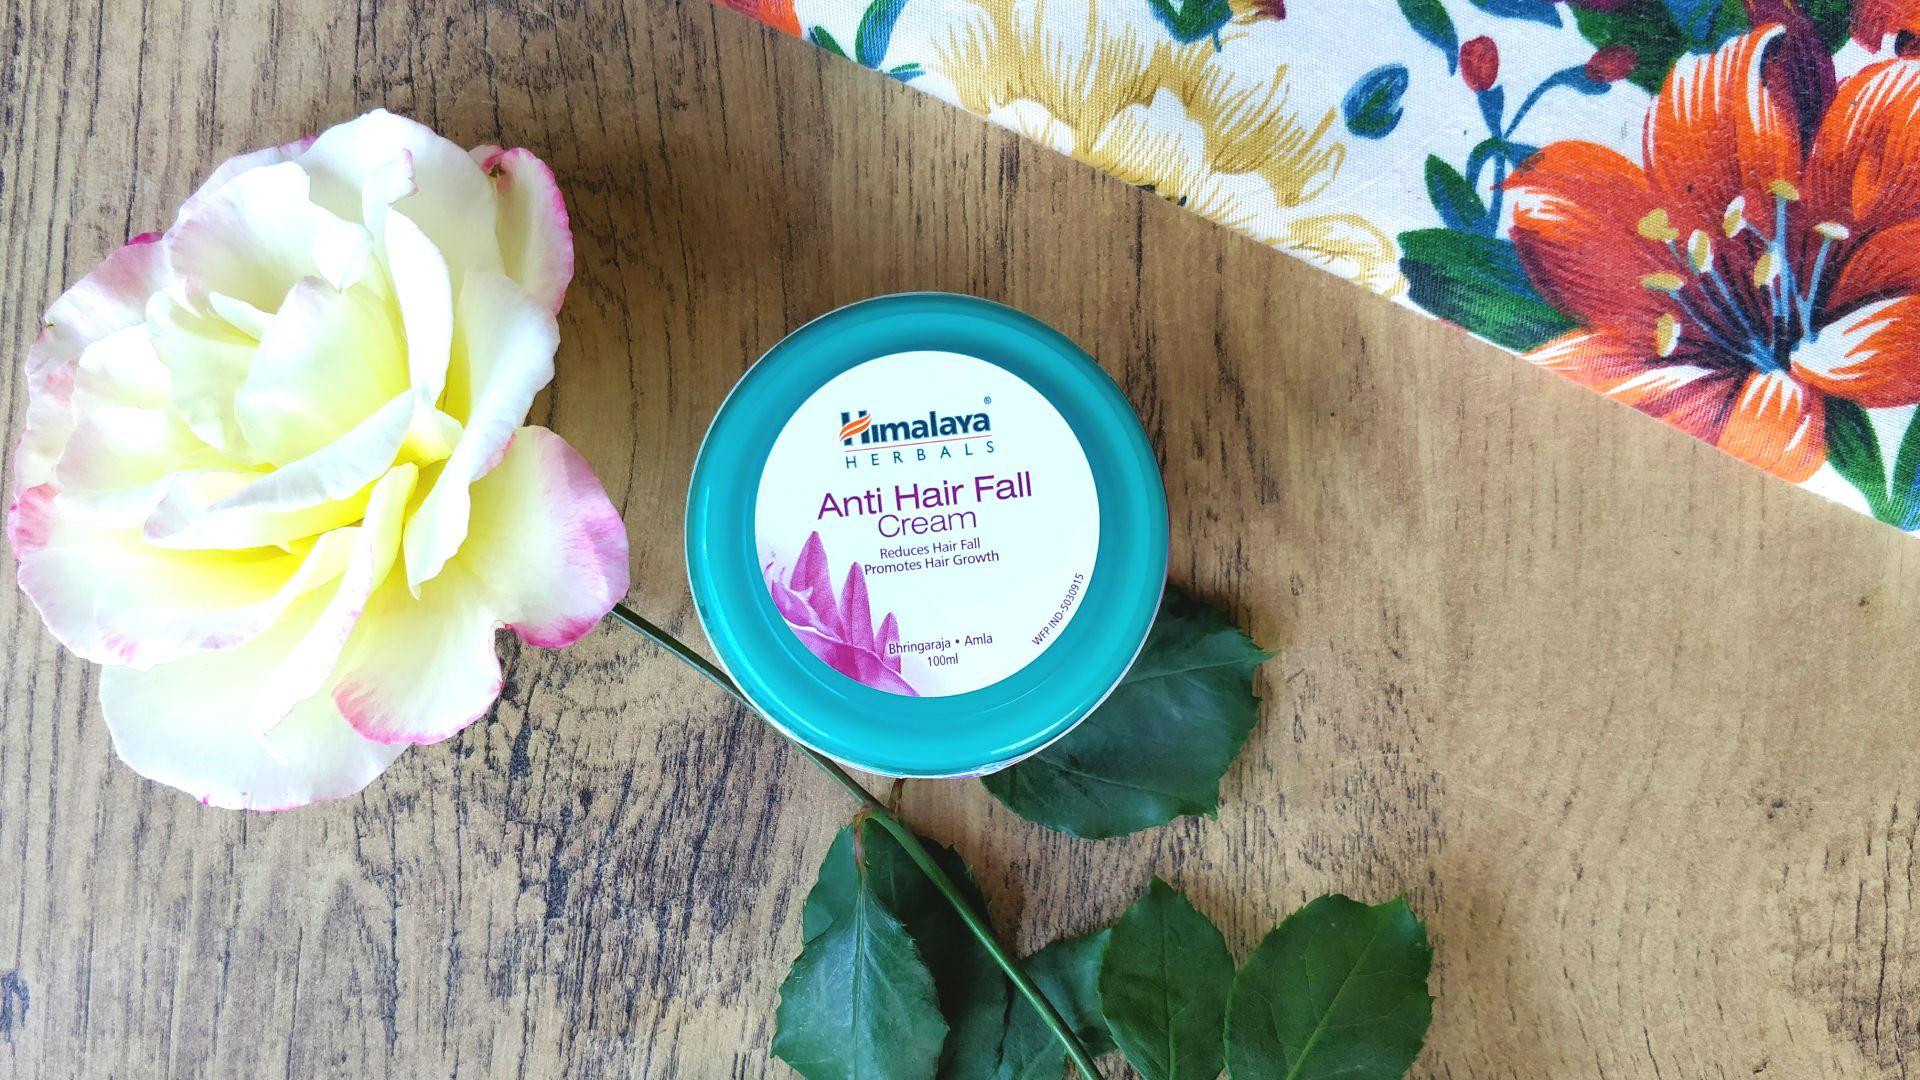 Himalaya Herbals Anti-Hair Fall Cream